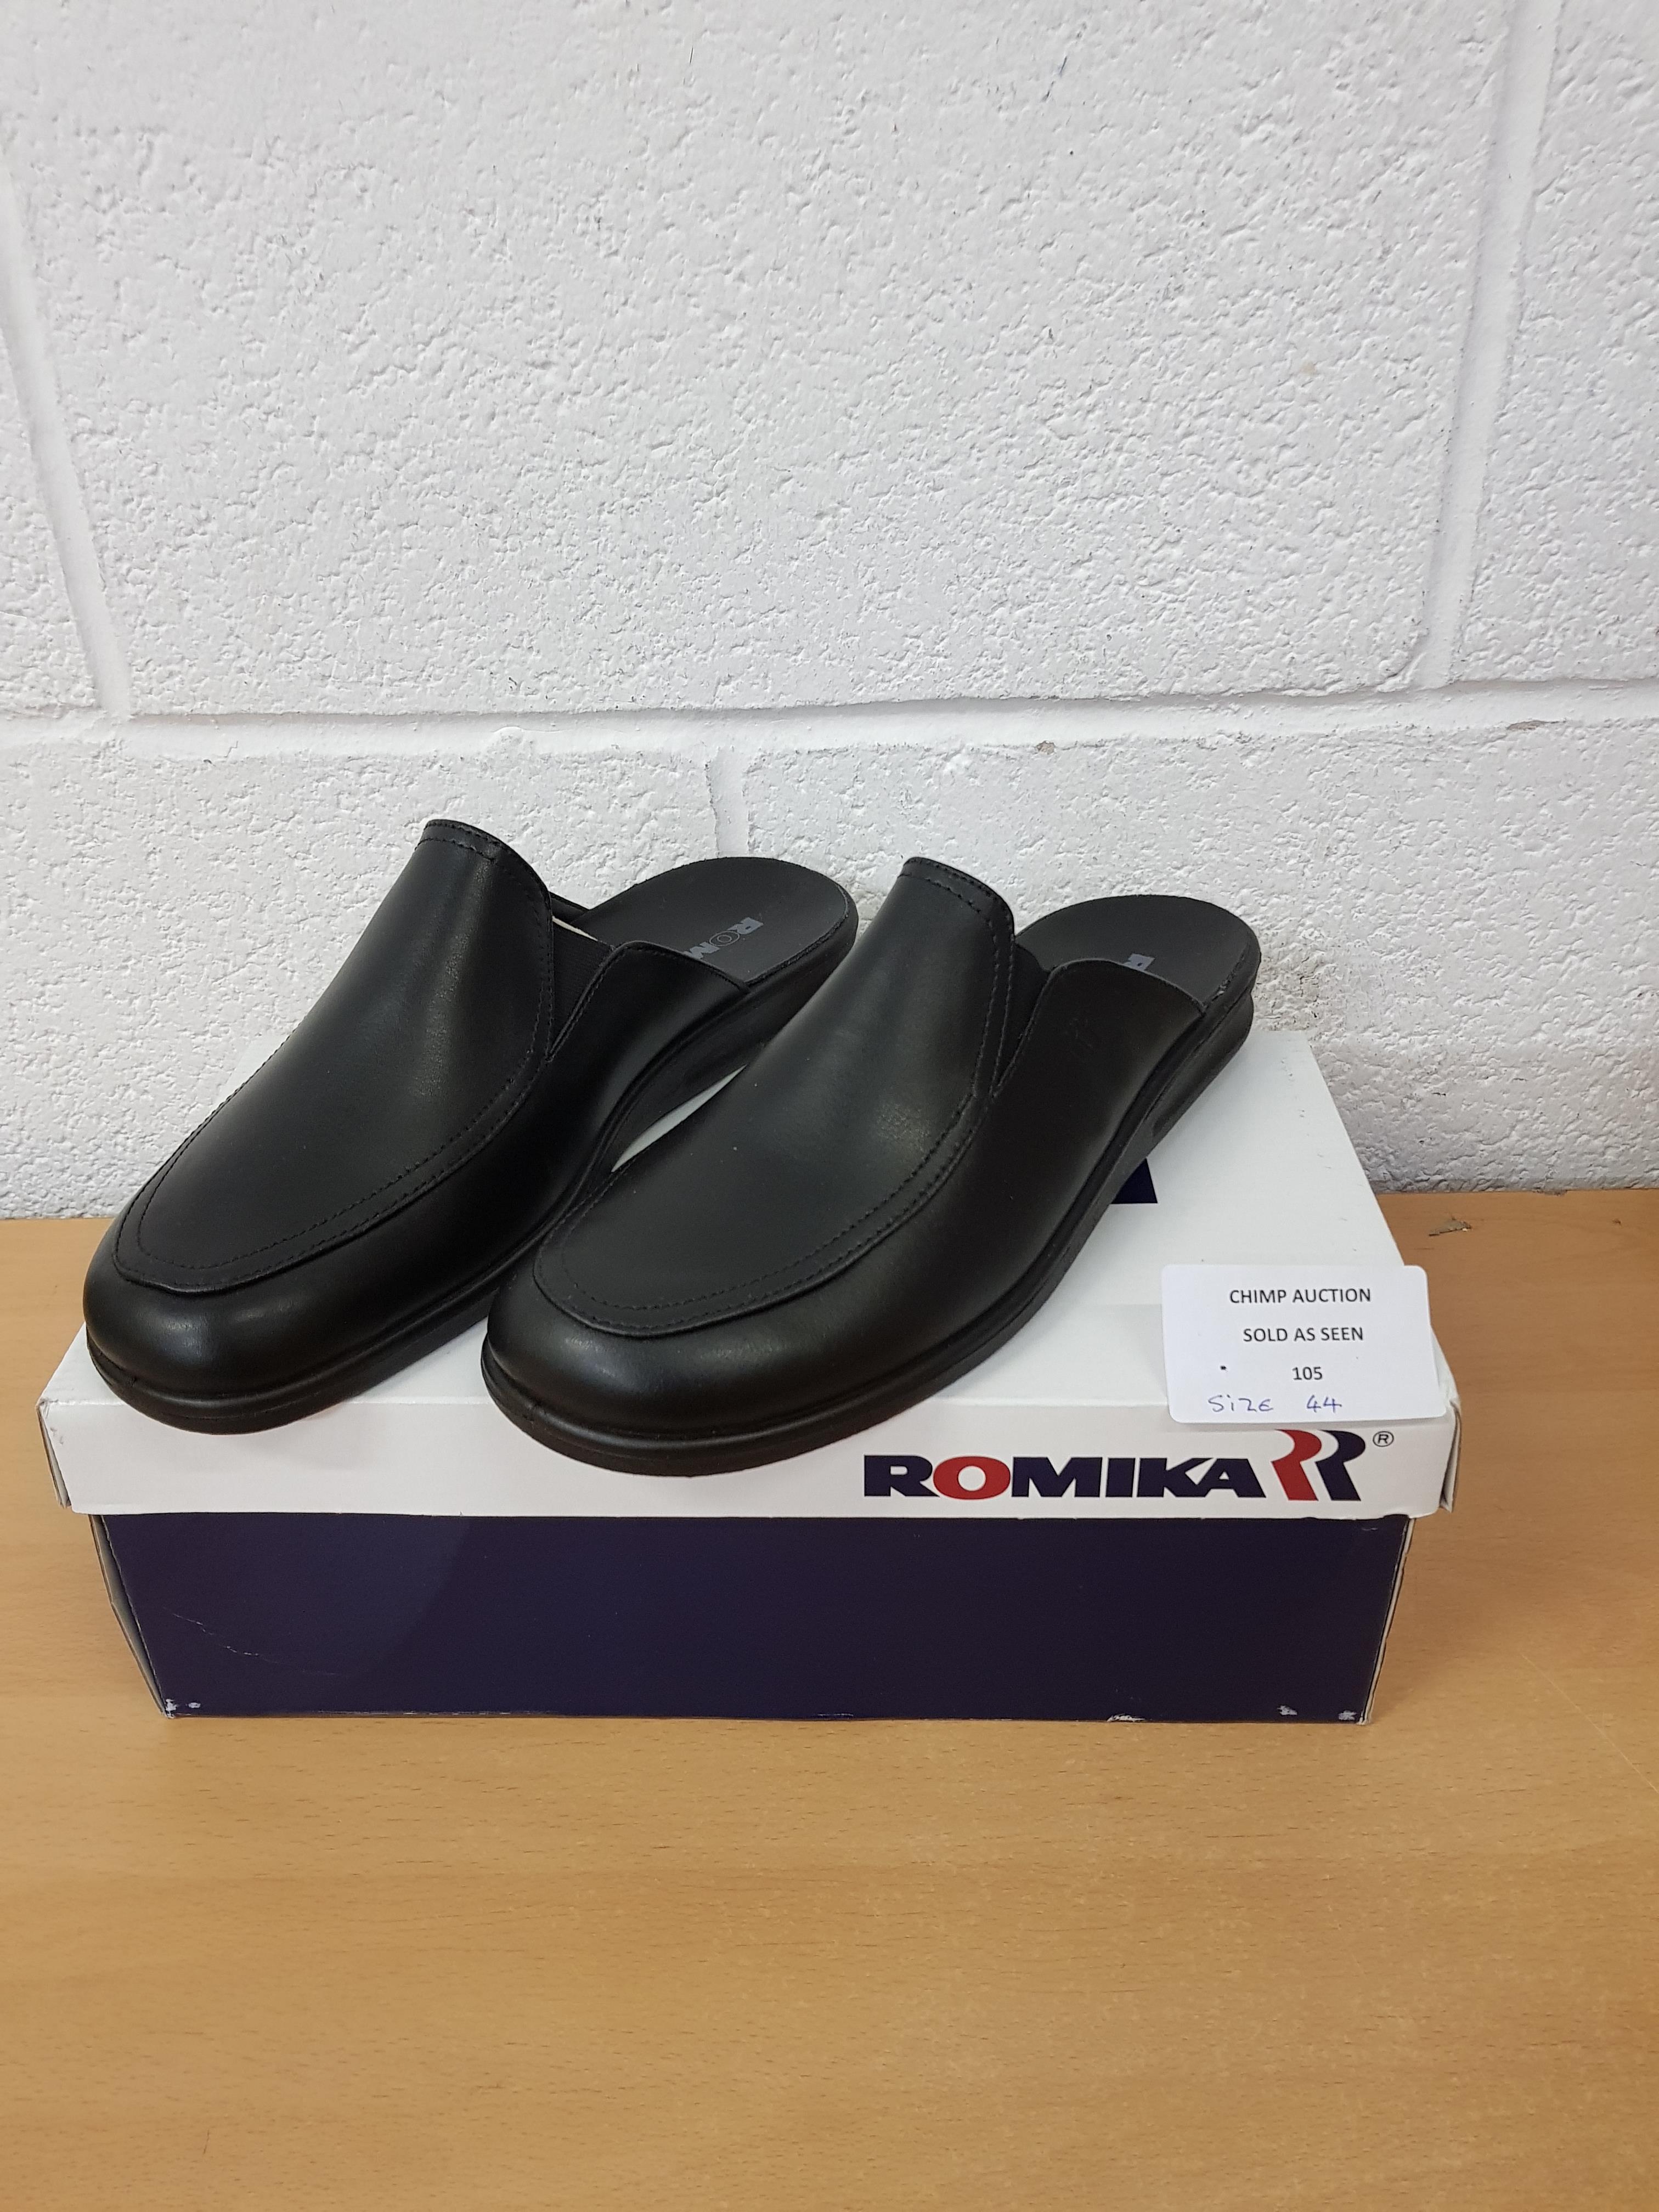 Lot 105 - Romika ladies sandals EU 44